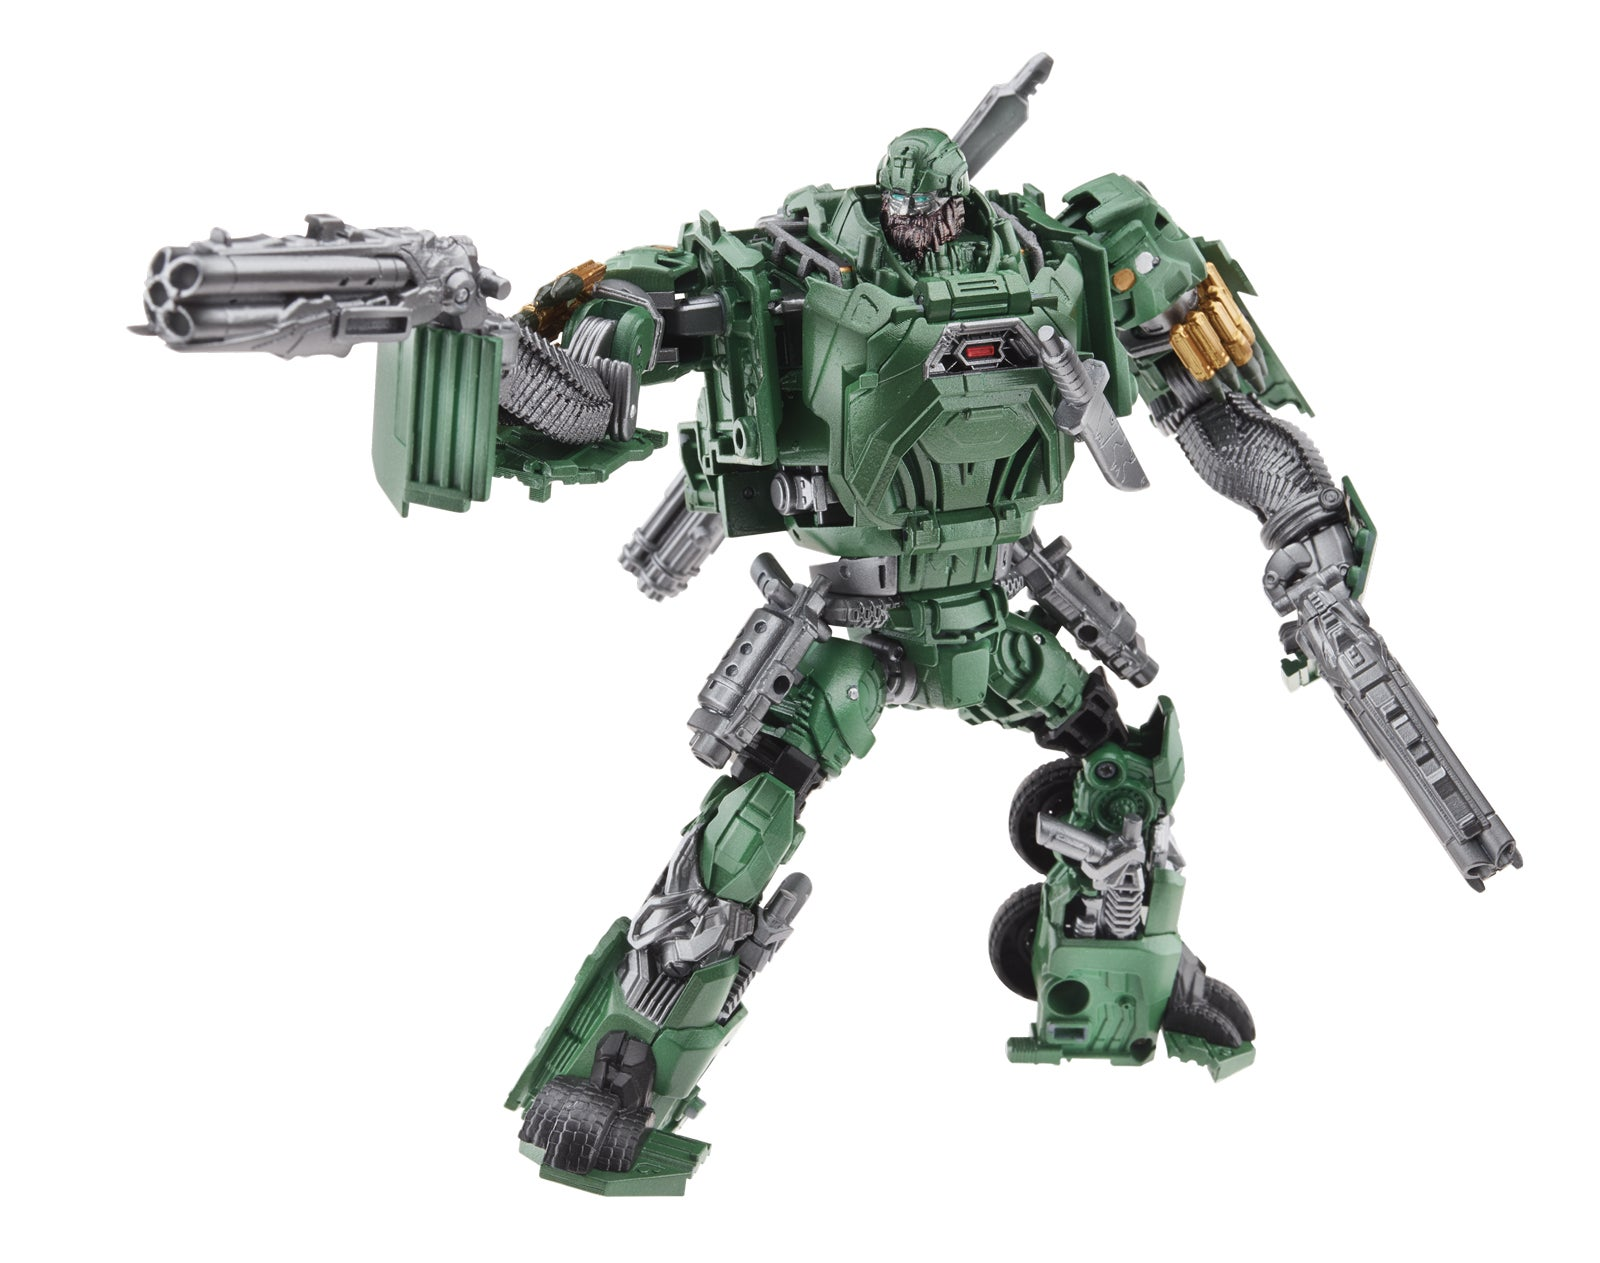 transformers-age-of-extinction-hound